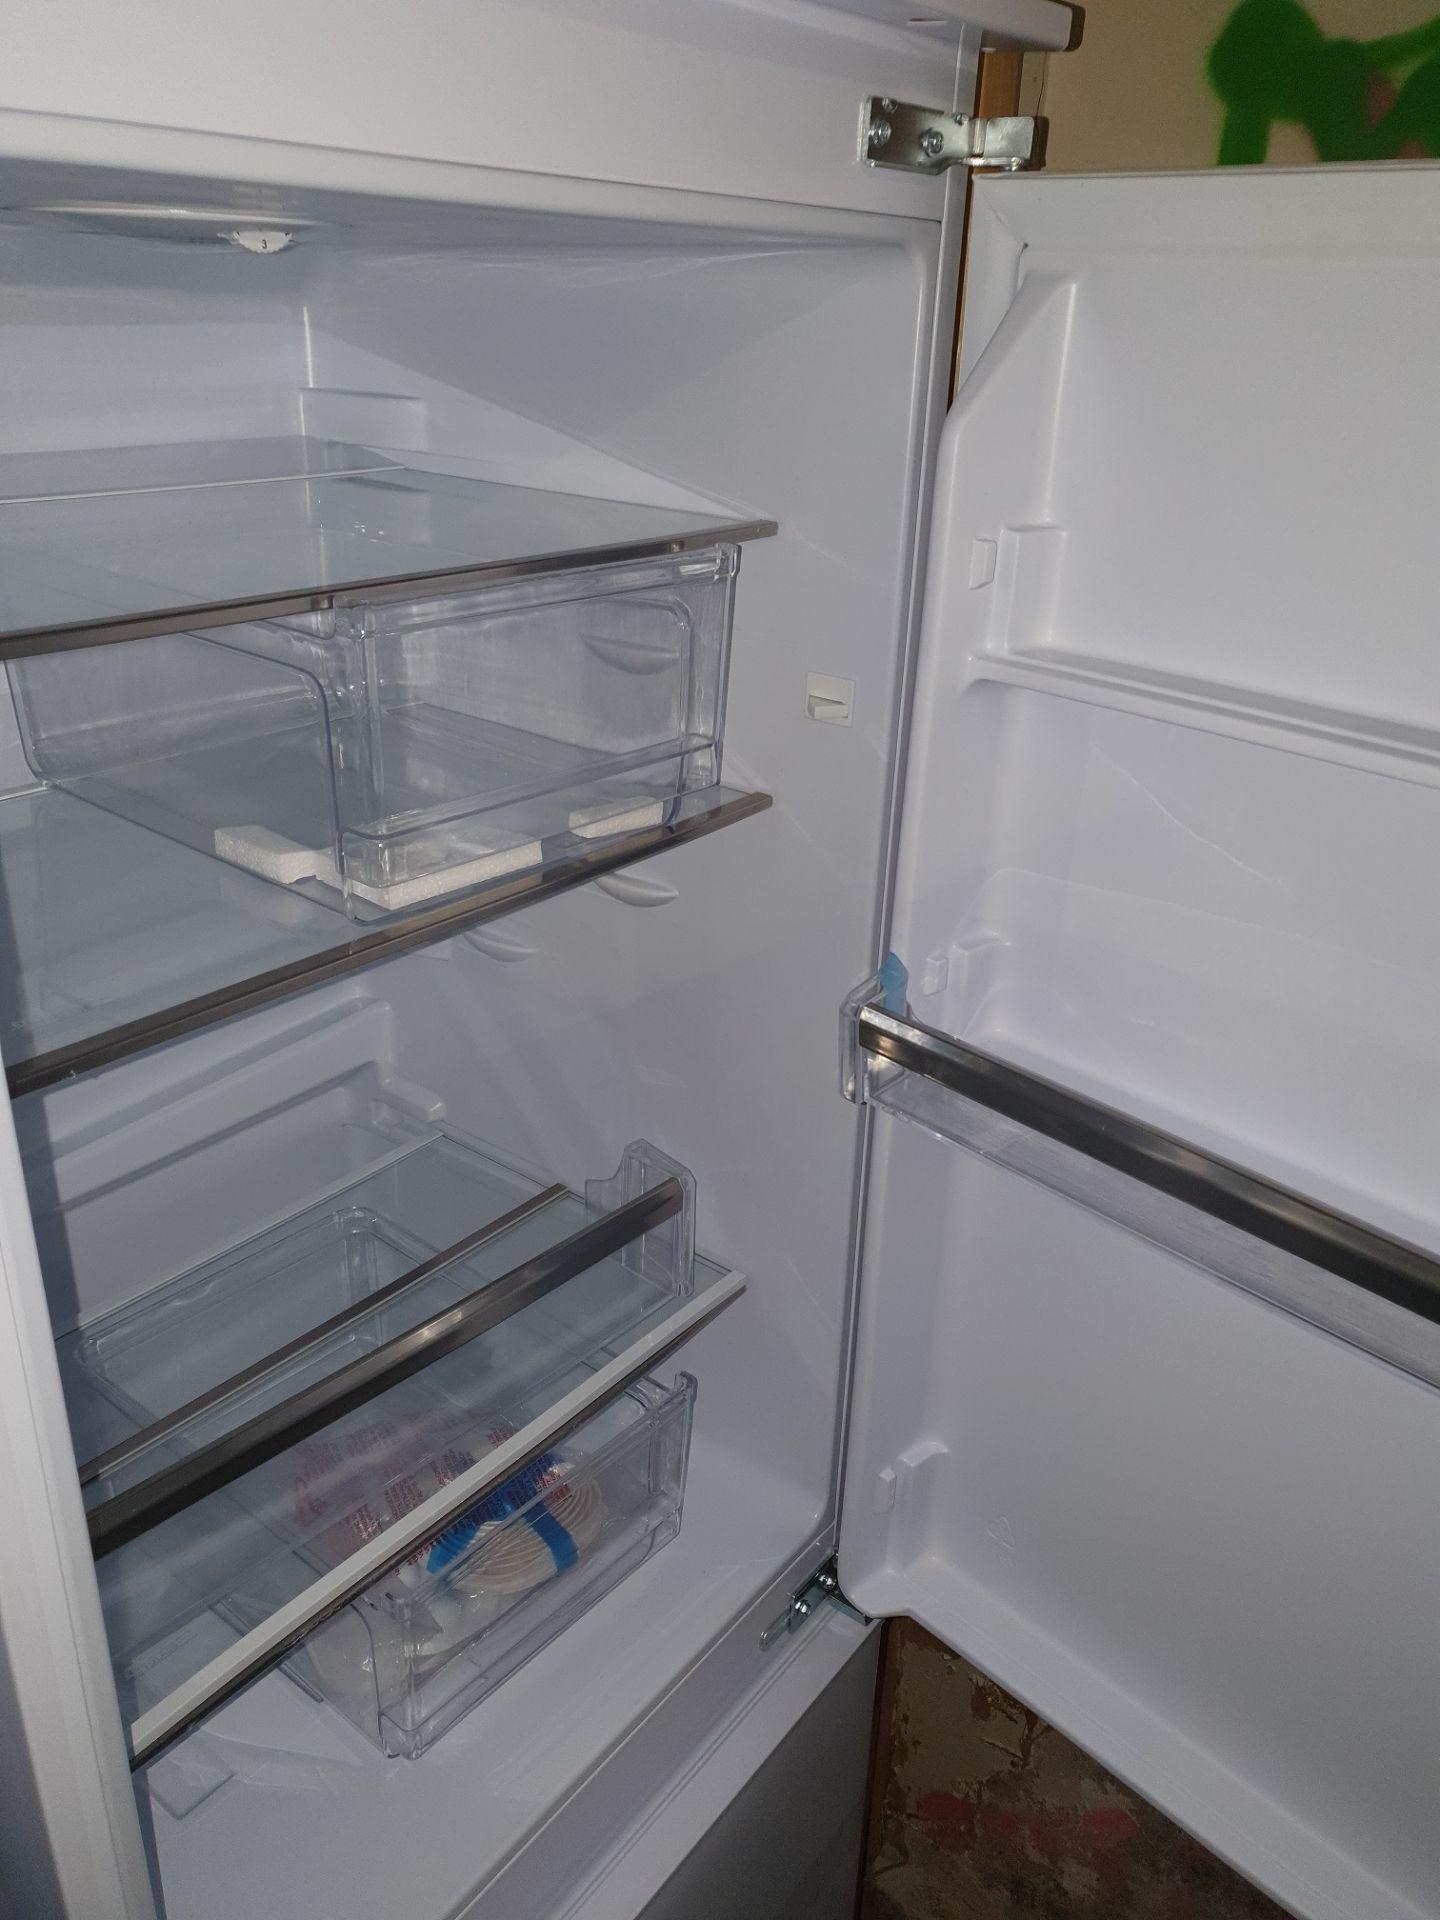 NEW/GRADED AND UNPACKAGED Zanussi ZBB27450SV Integrated 50/50 Fridge Freezer (Brand new slight - Image 13 of 14